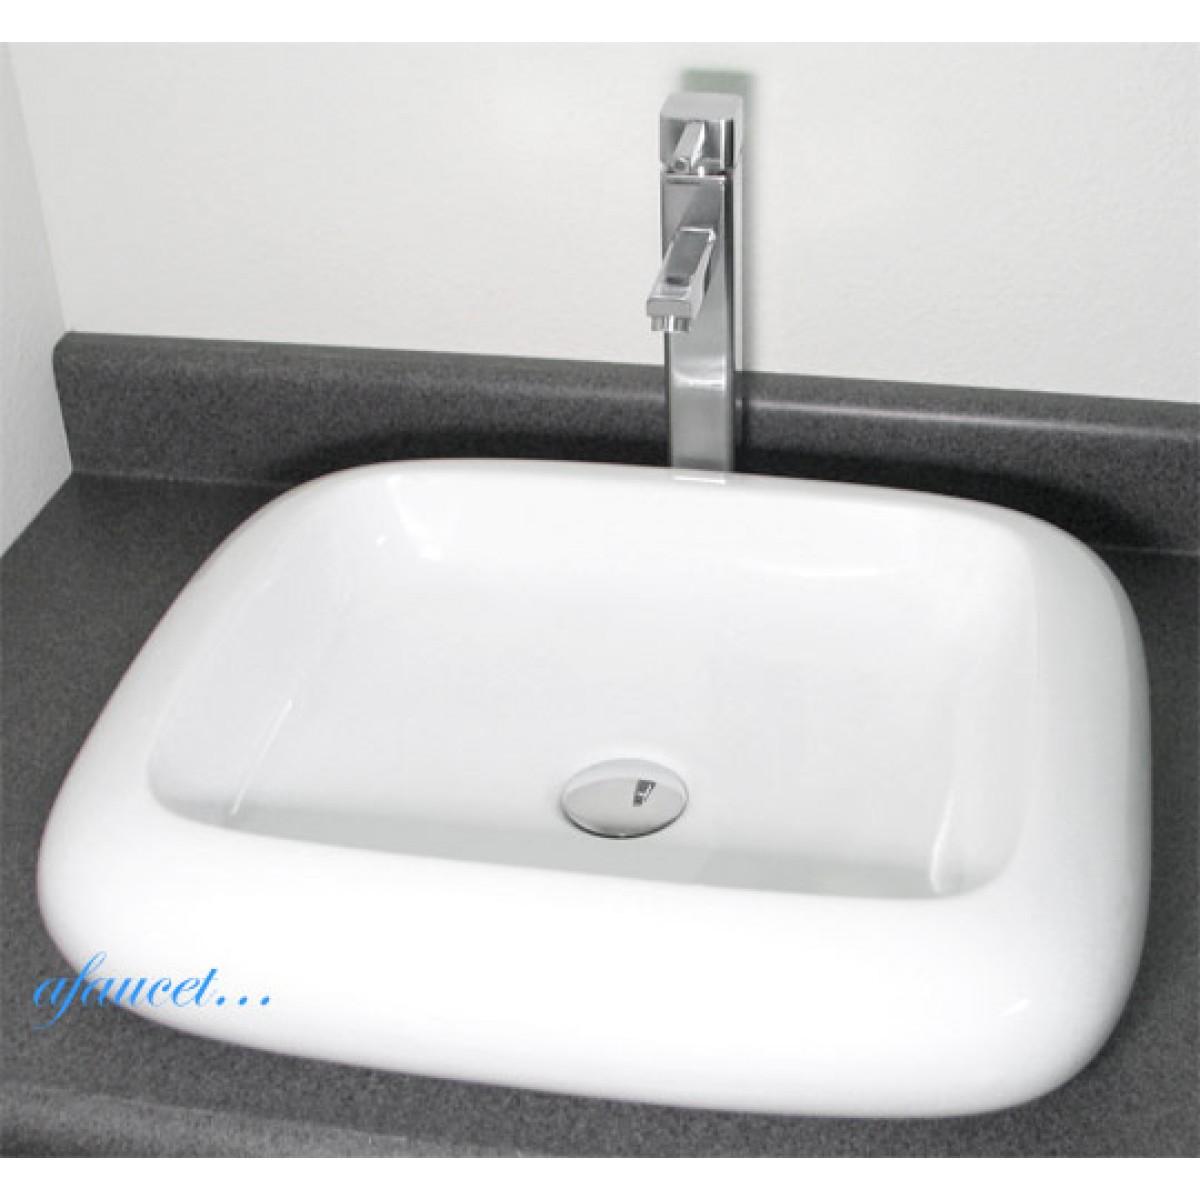 Rounded Edge Rectangular Porcelain Ceramic Countertop Bathroom Vessel Sink 22 X 19 Inch